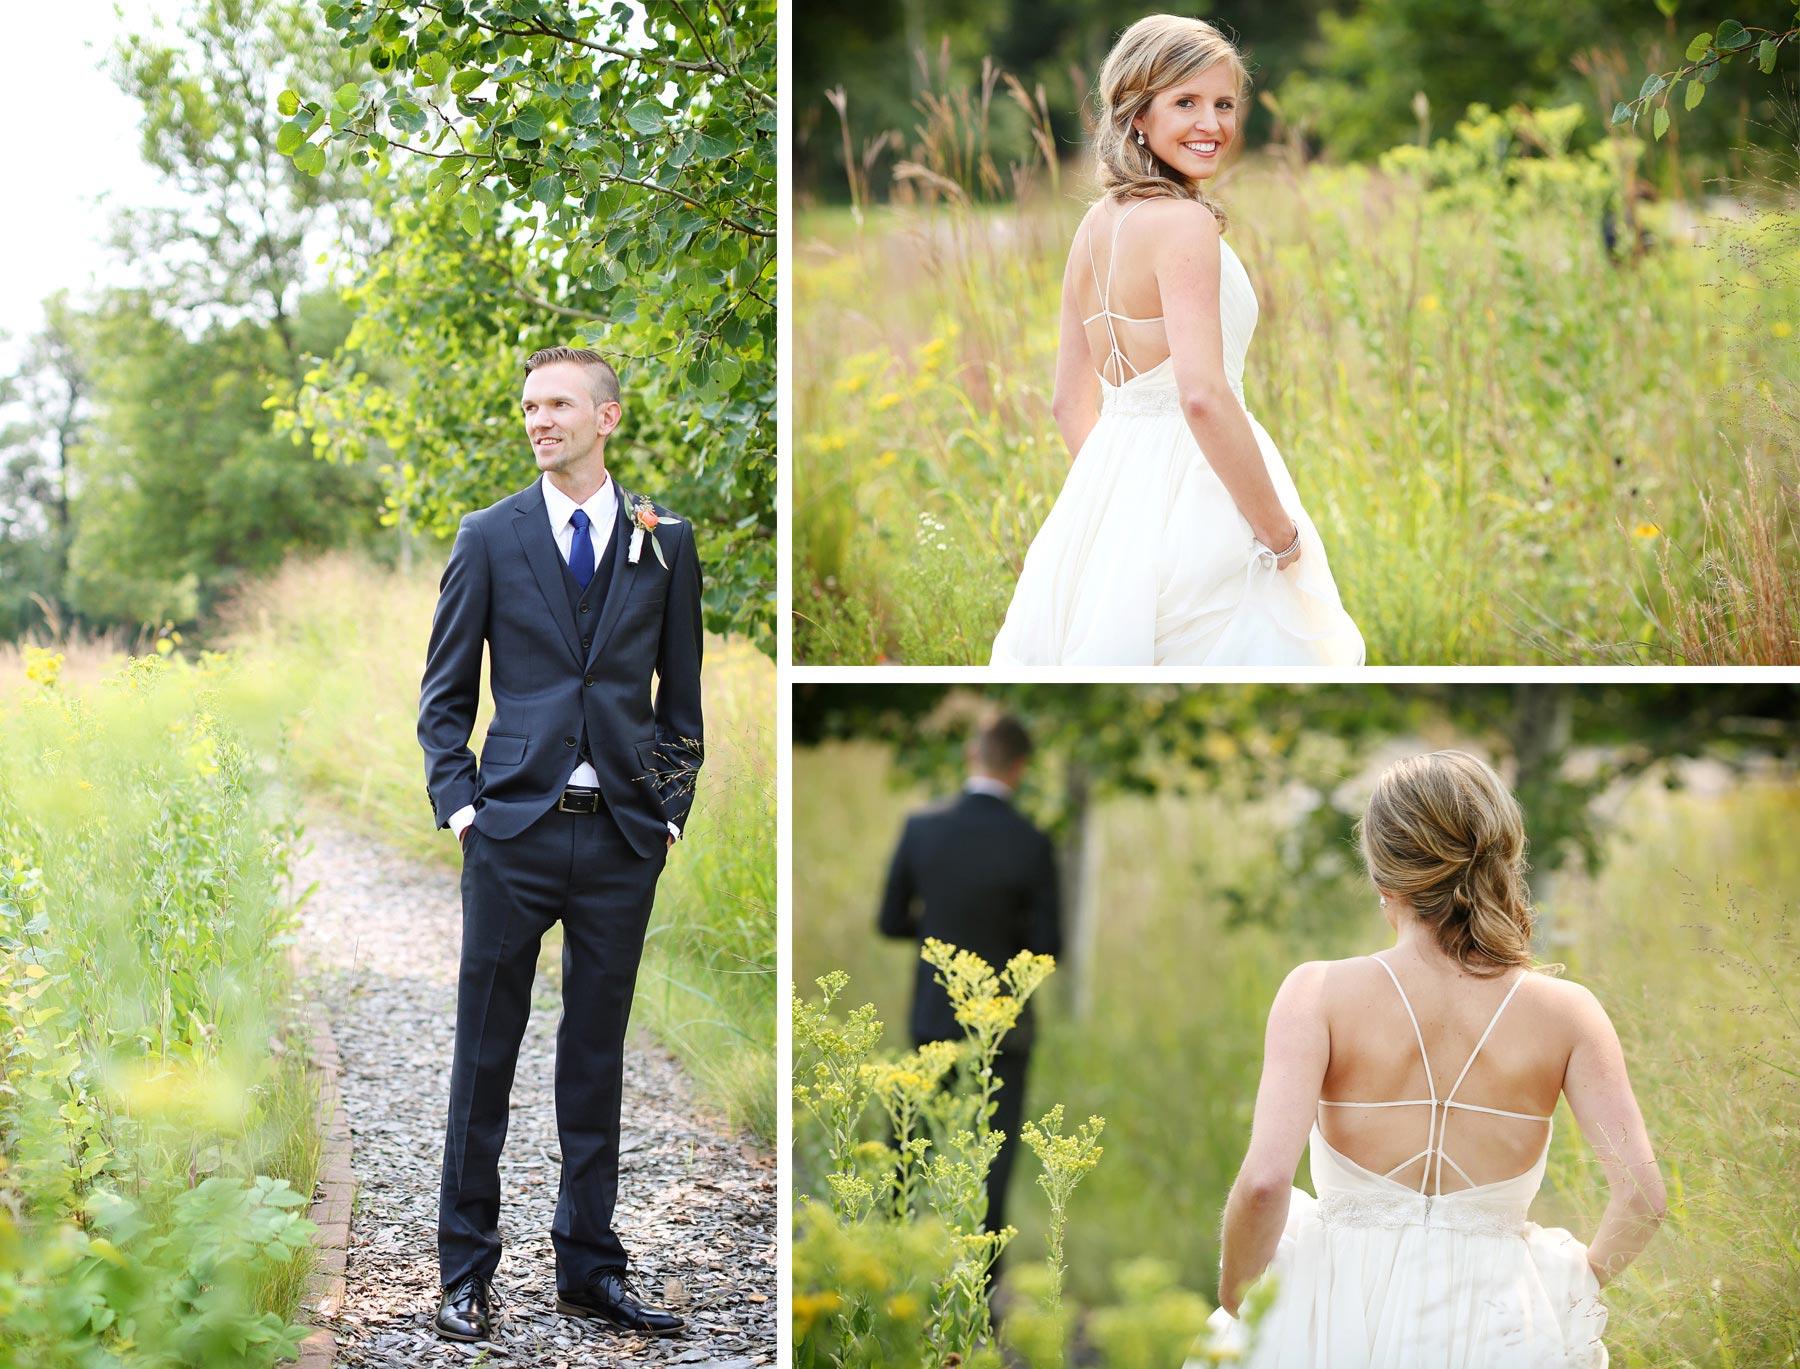 02-Minneapolis-Minnesota-Wedding-Photography-by-Vick-Photography-Field-First-Look-Jess-&-Jake.jpg